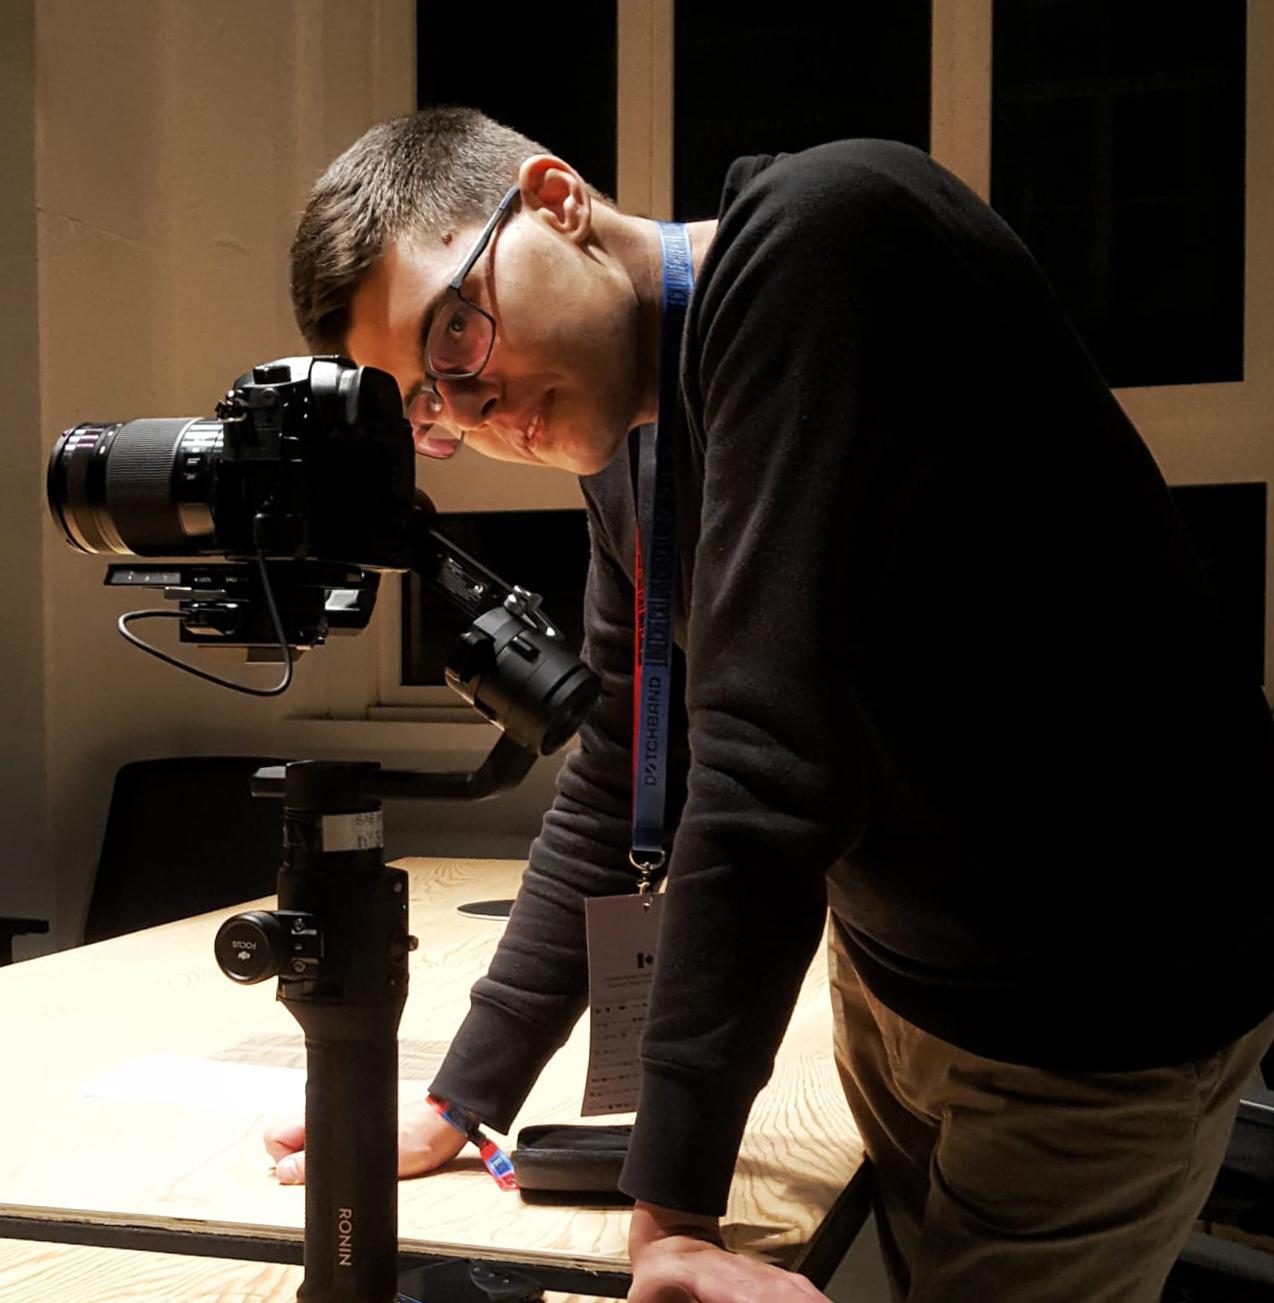 Matteo Bollati - Videomaker a Cislago